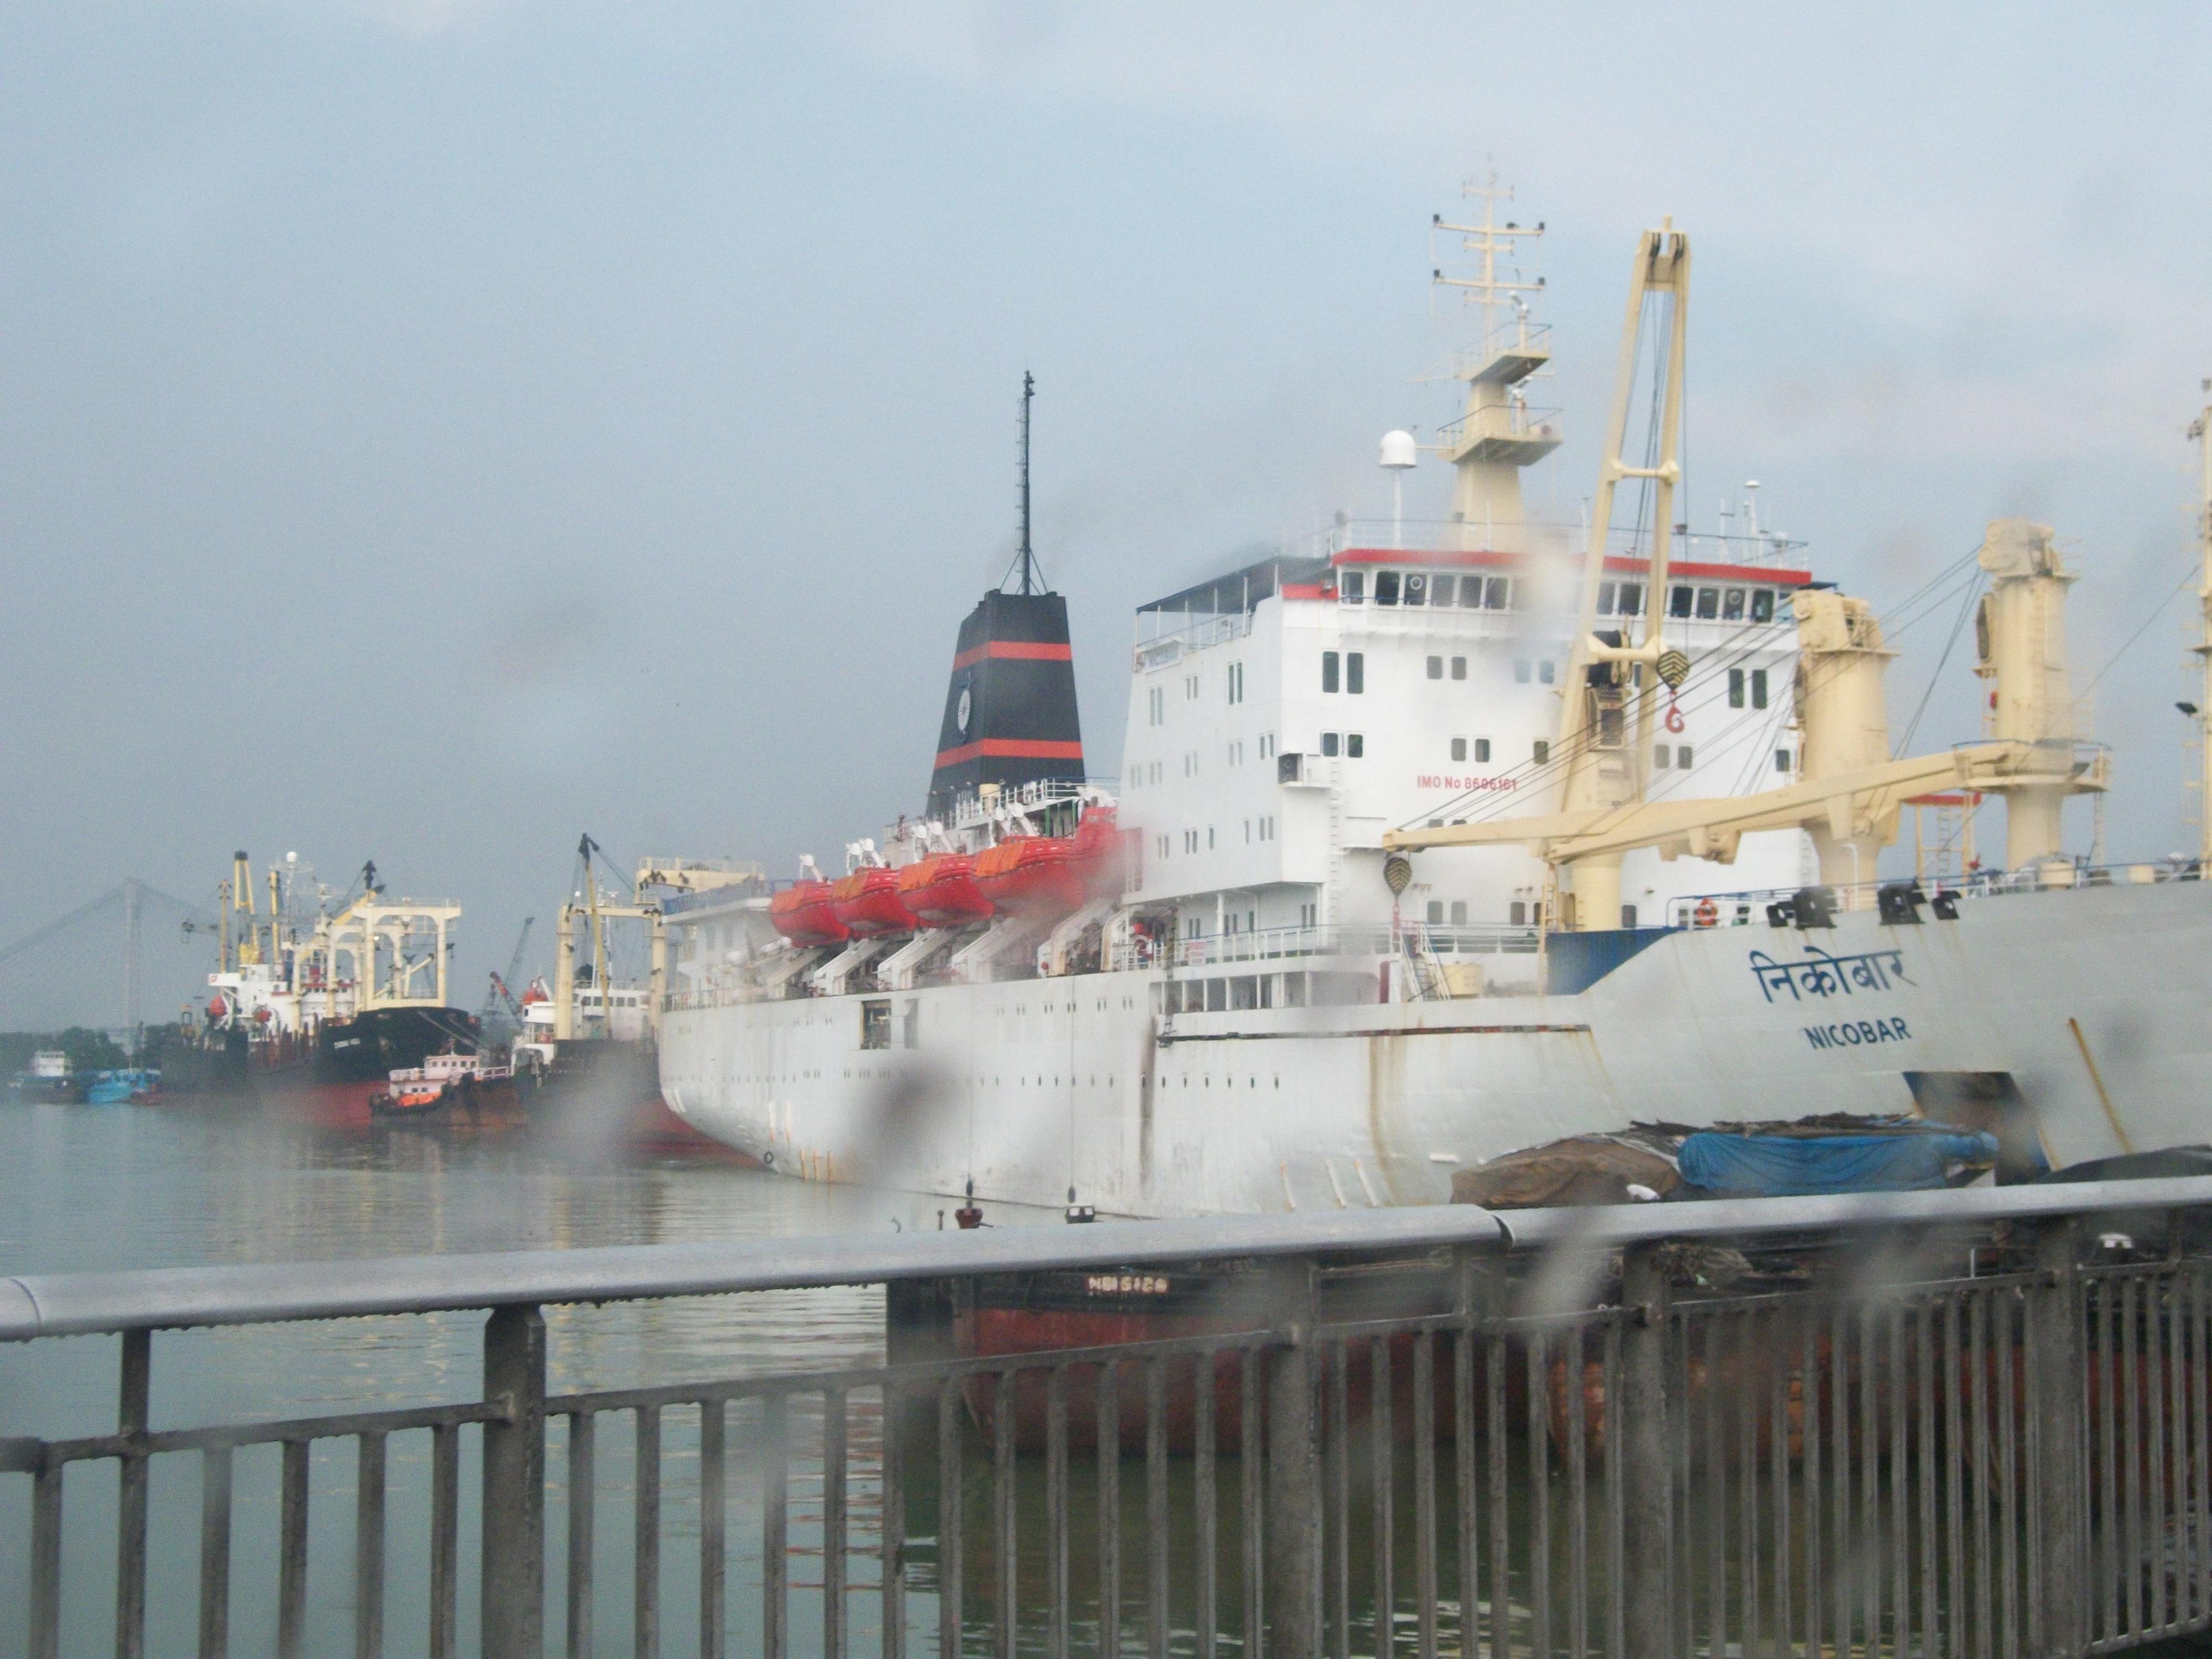 A Nicobar ship at Kolkata's Harbour, I felt like hoping onto it to reach Nicobar early